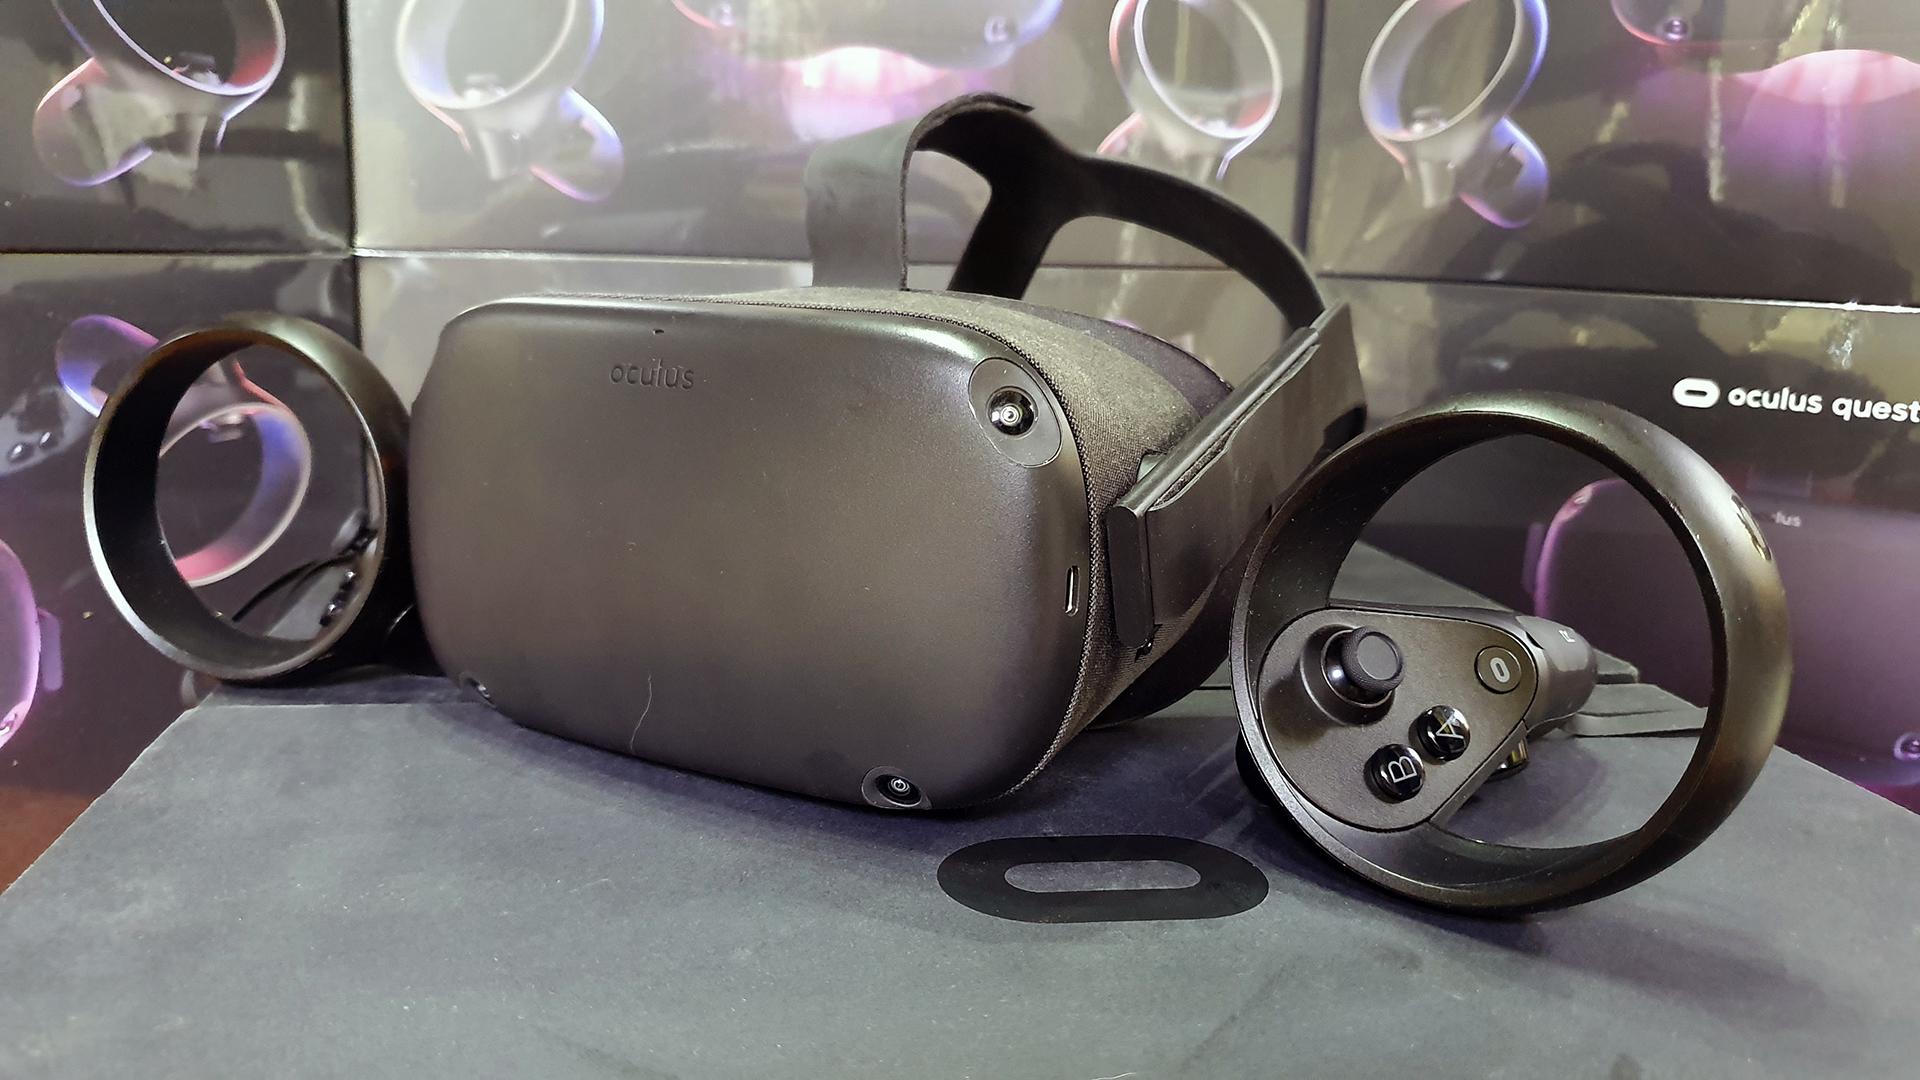 oculus-game-development-south-africa